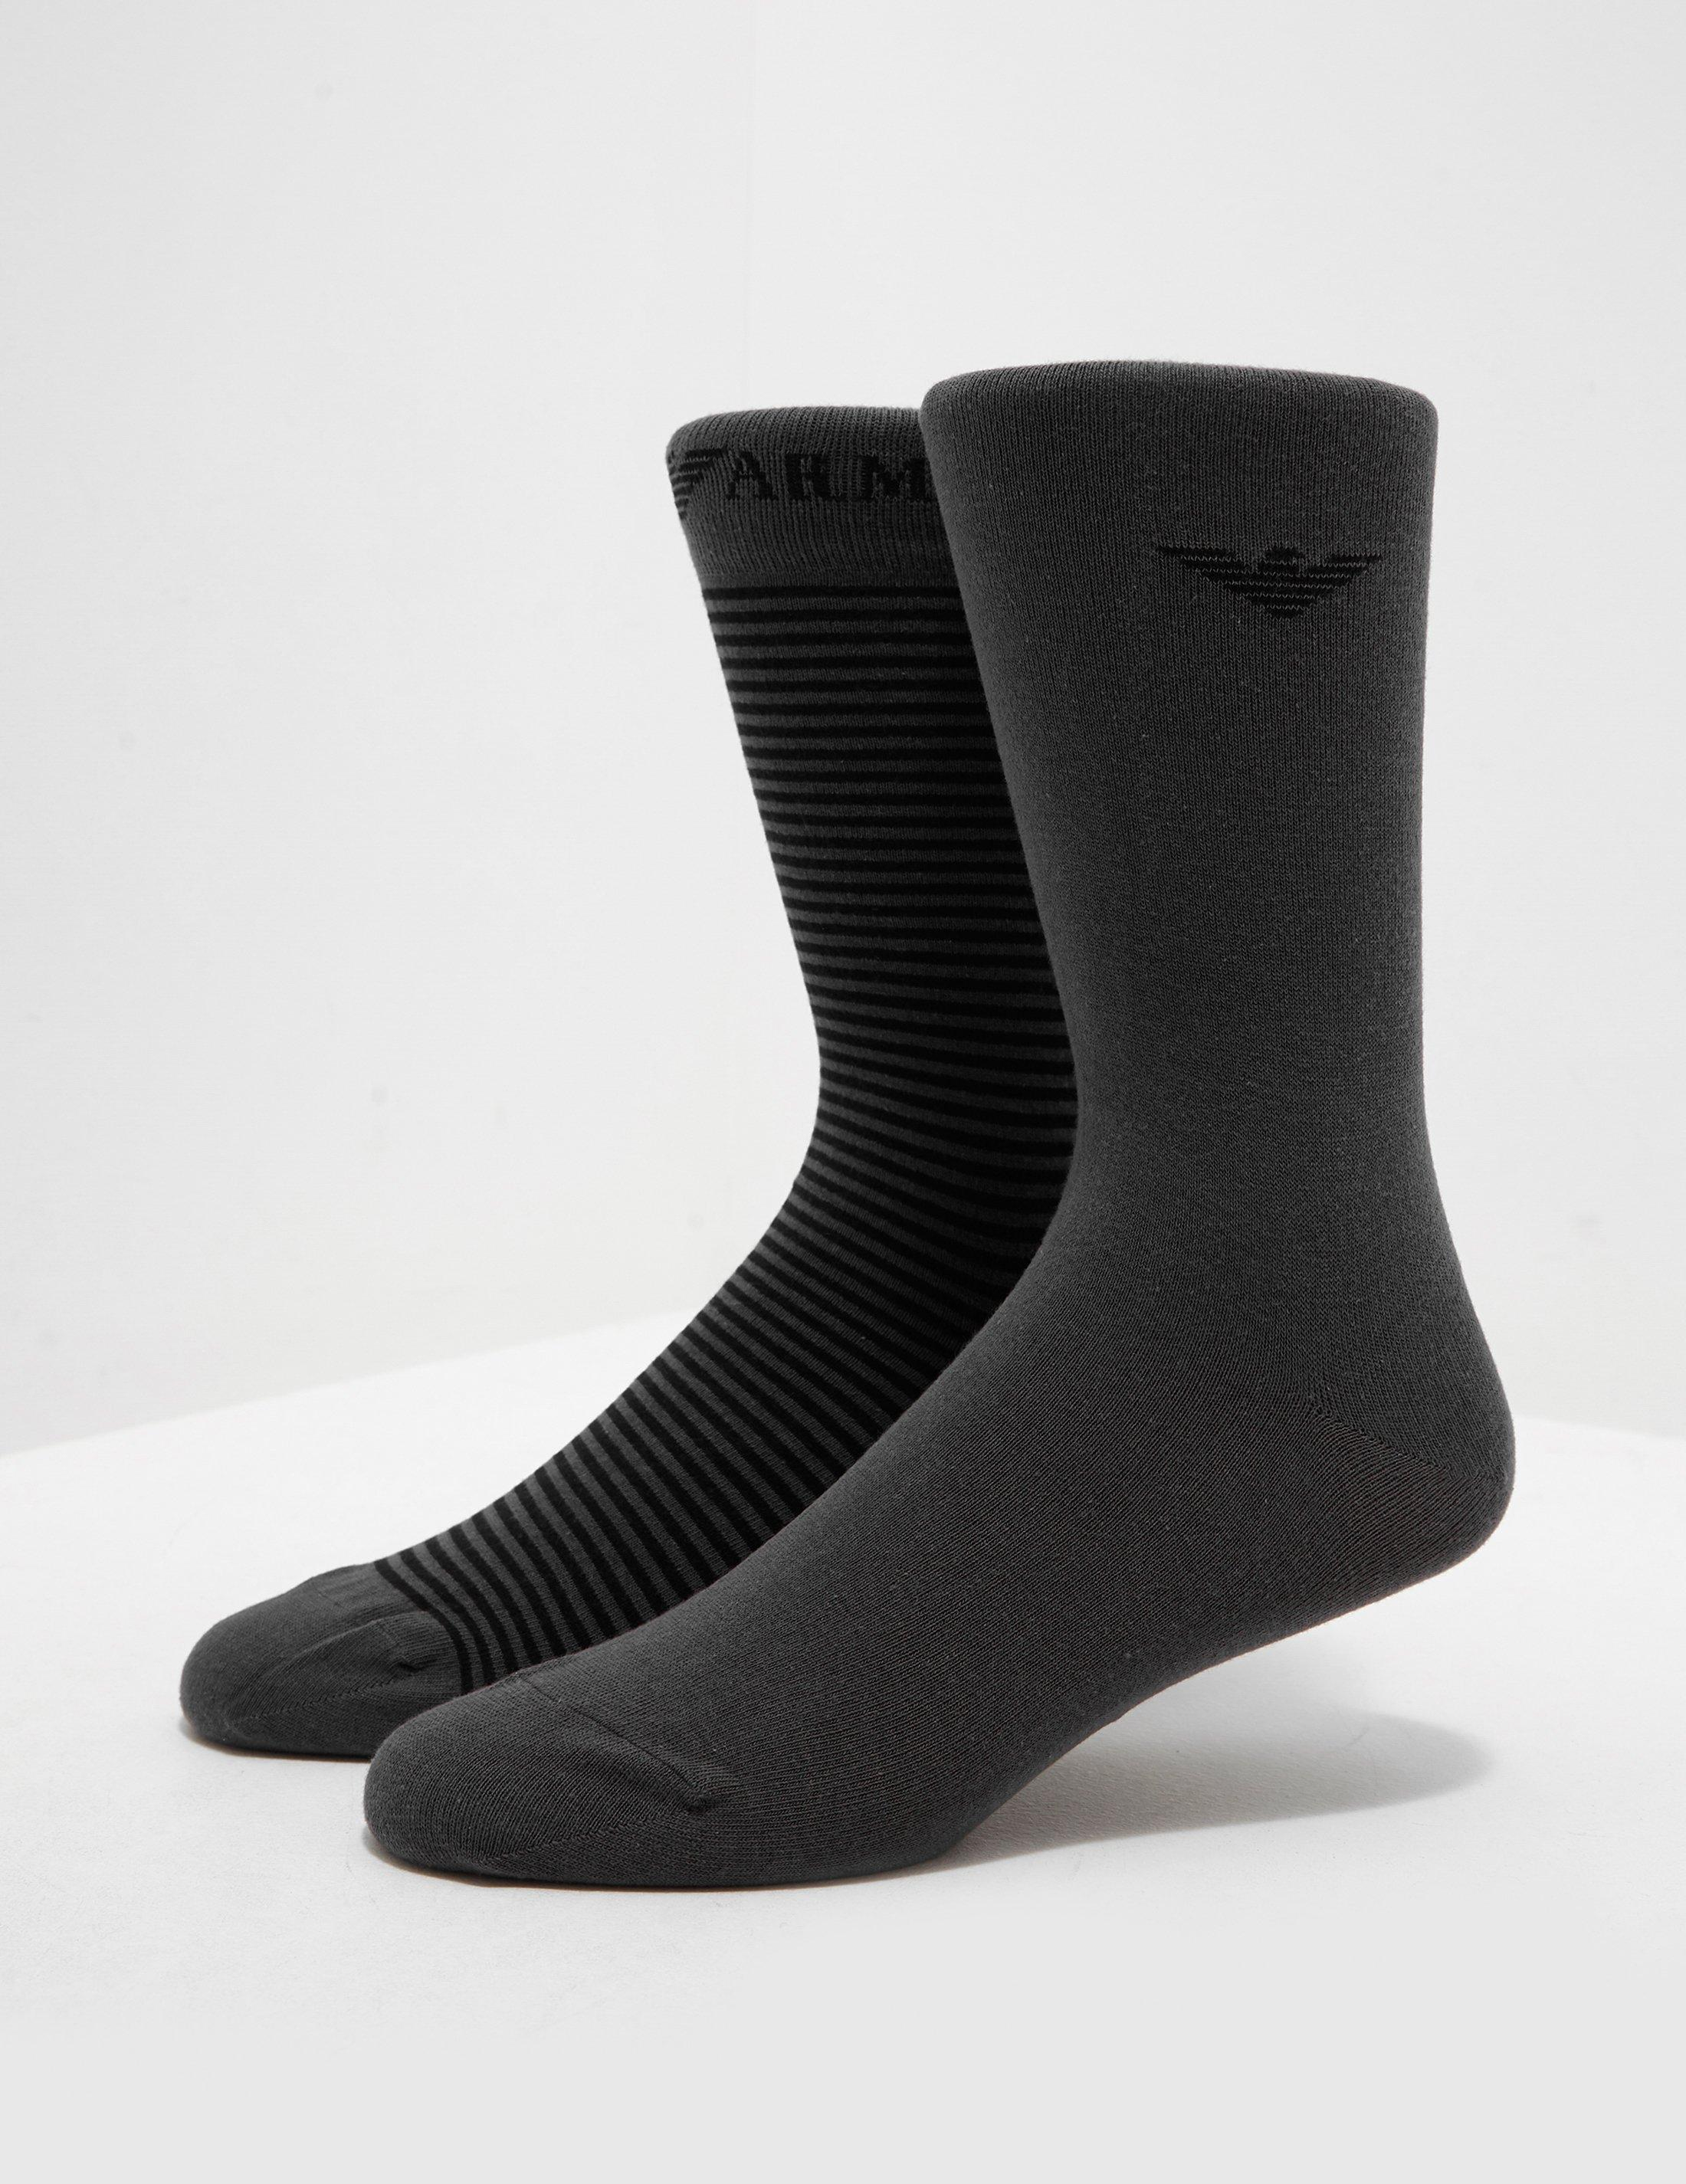 3182ceb6afa Emporio Armani Mens 2-pack Stripe Socks Grey in Gray for Men - Lyst